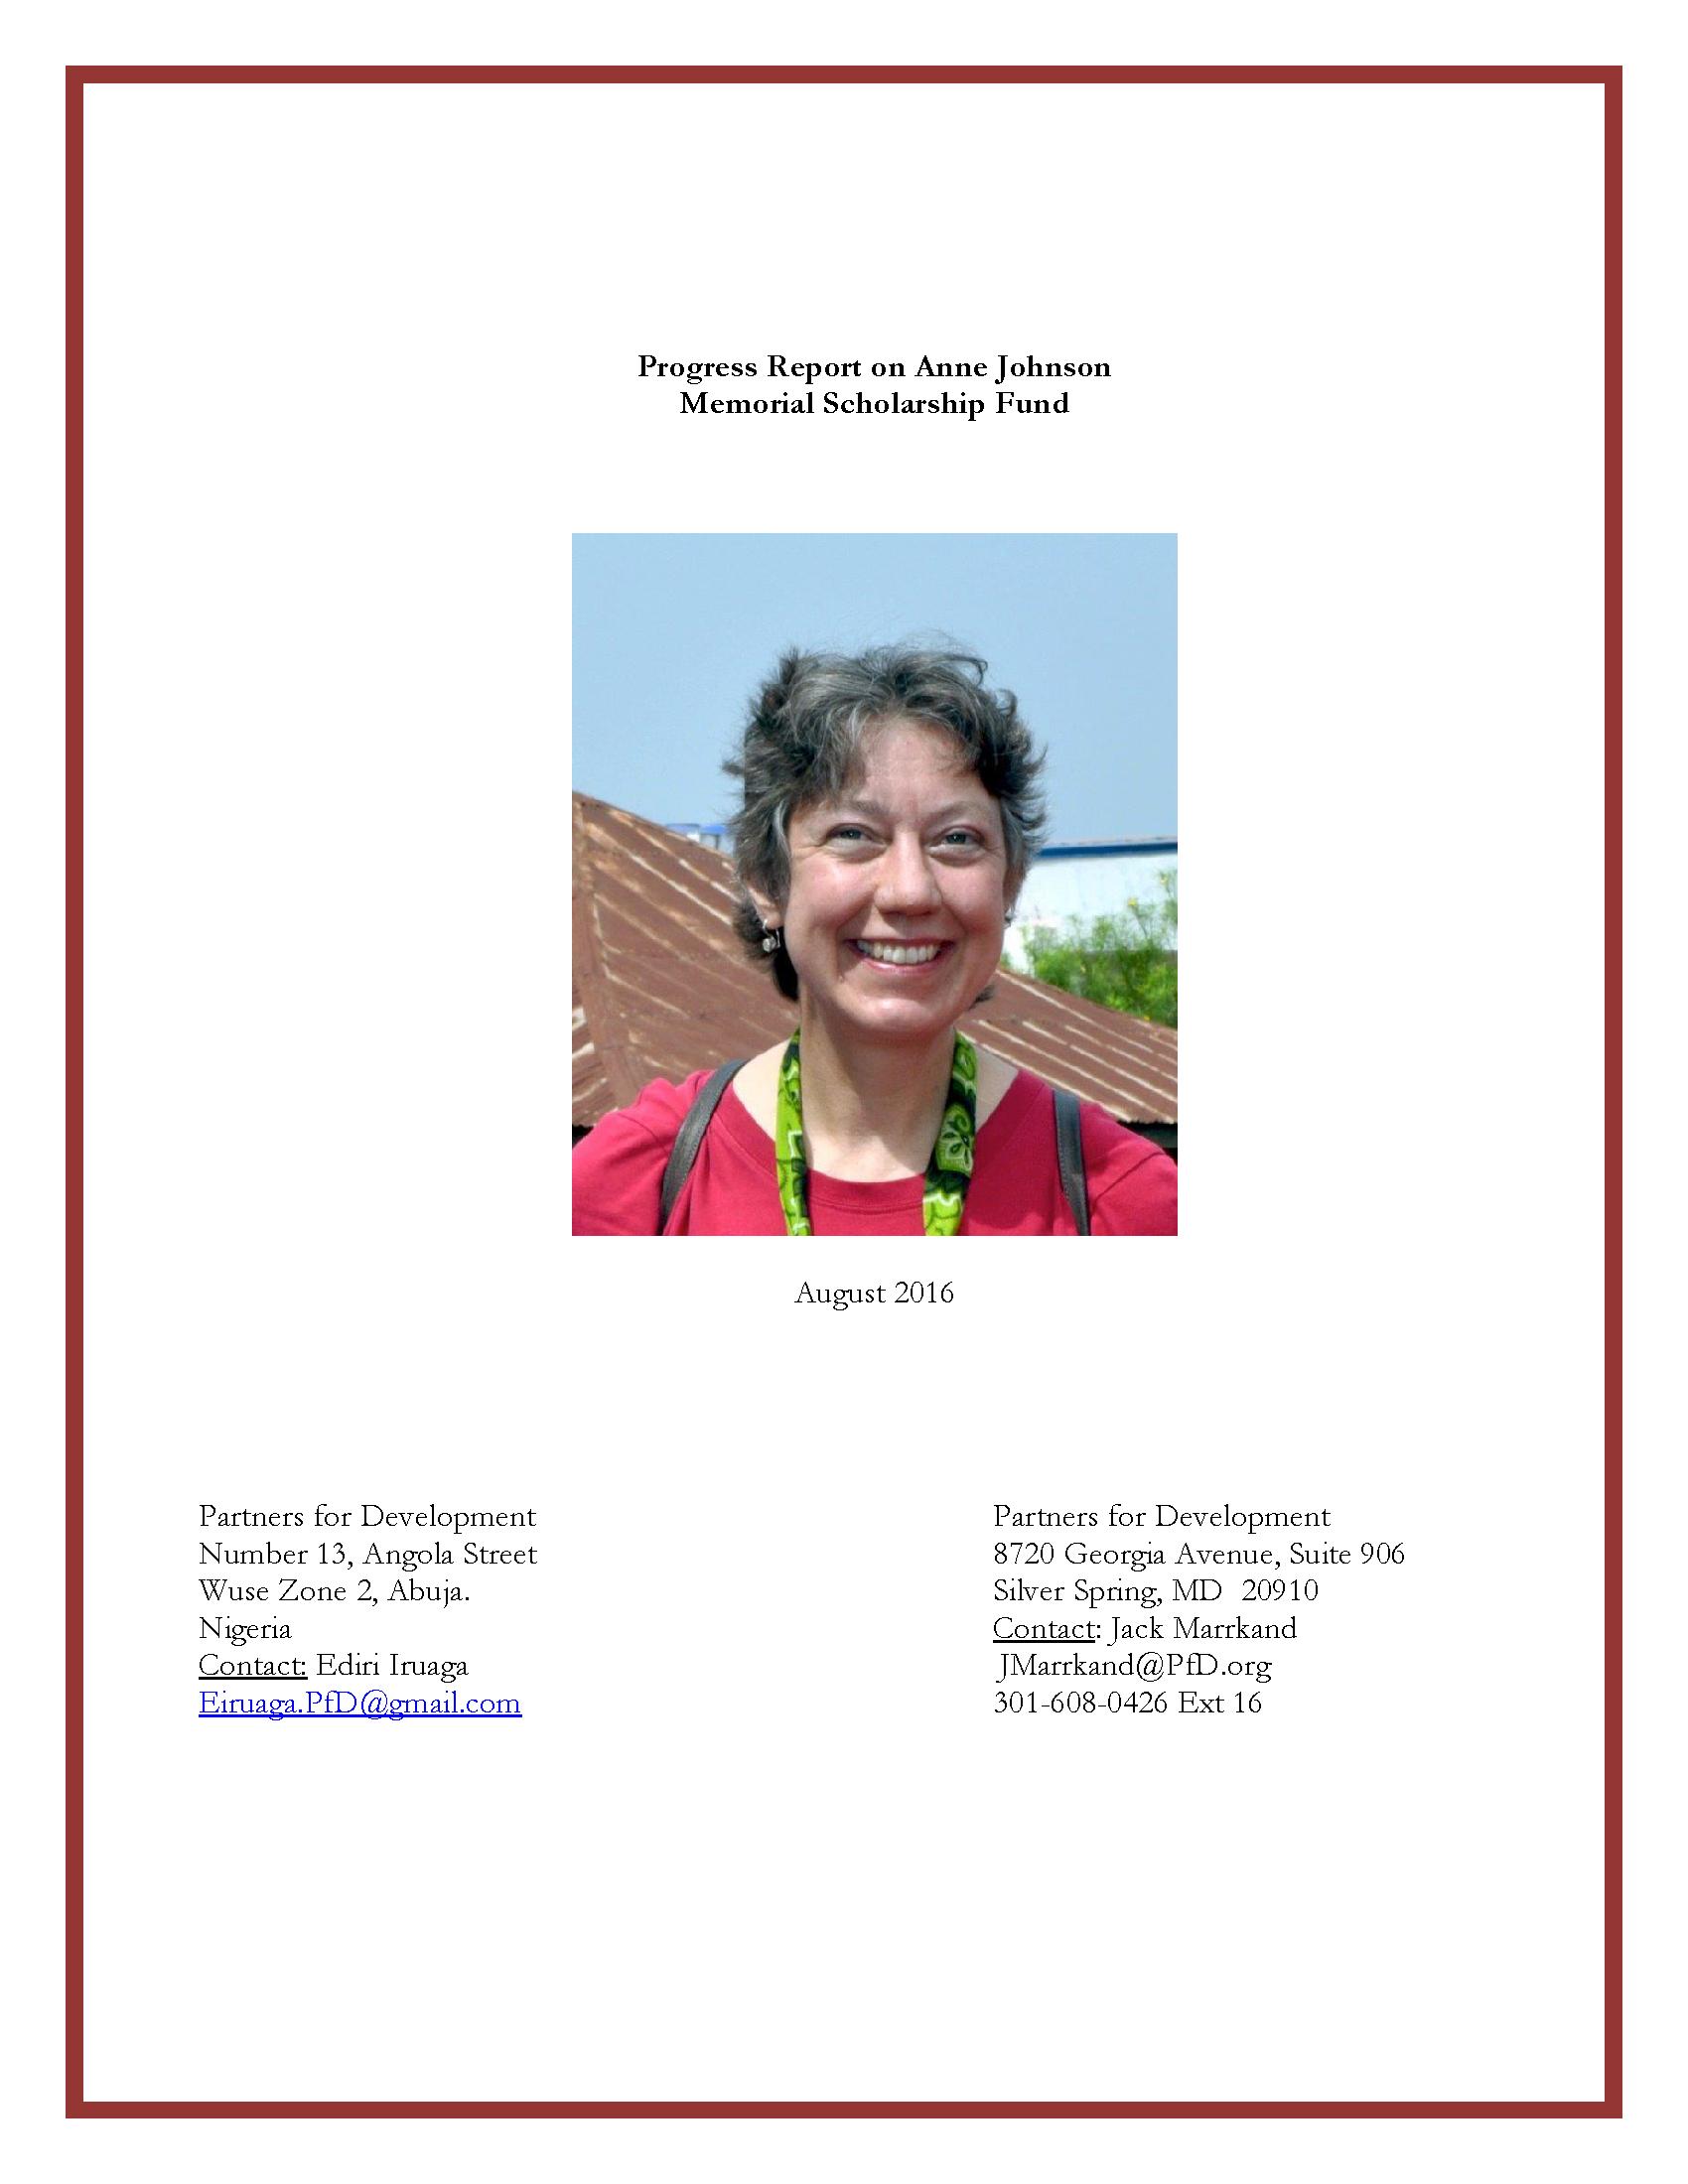 Progress Report Three on Anne Johnson Memorial Scholarship Fund - August 2016